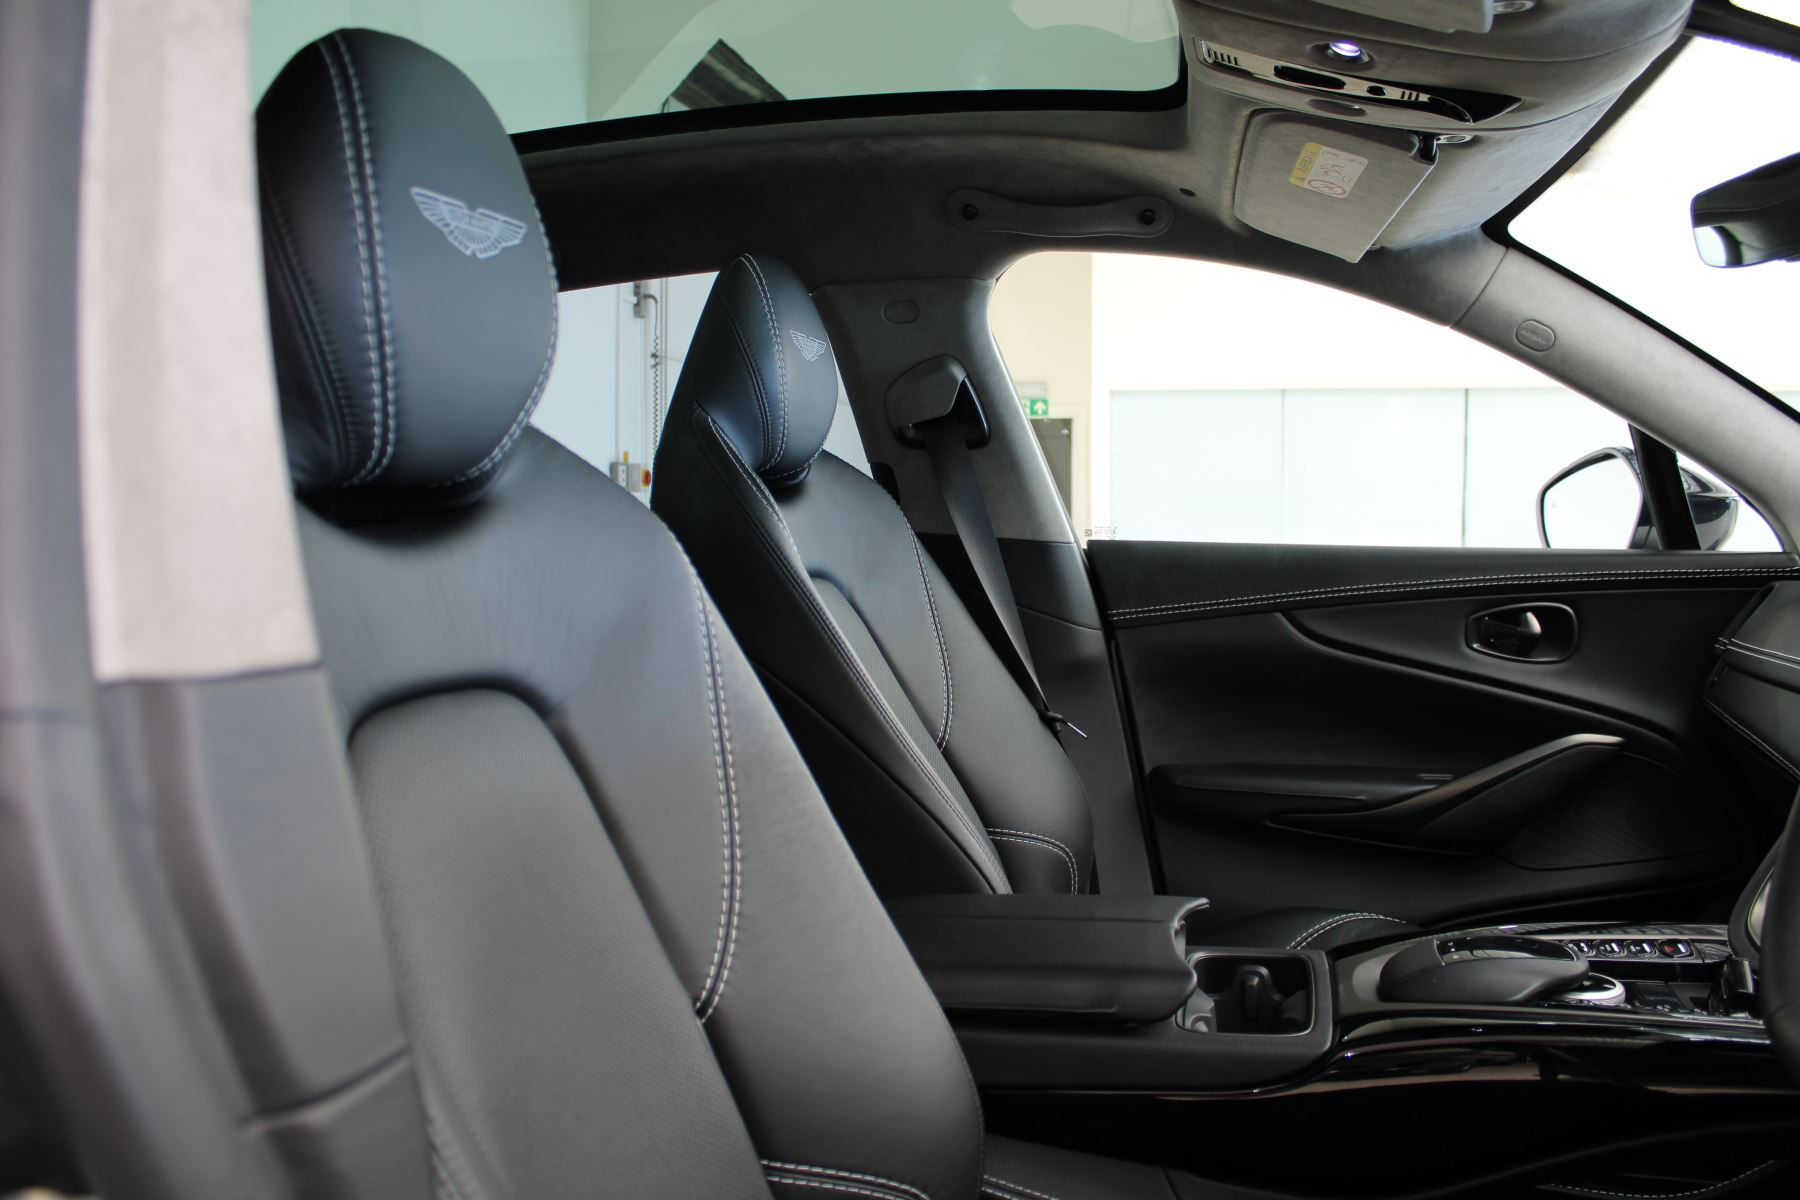 Aston Martin DBX V8 550 Touchtronic image 7